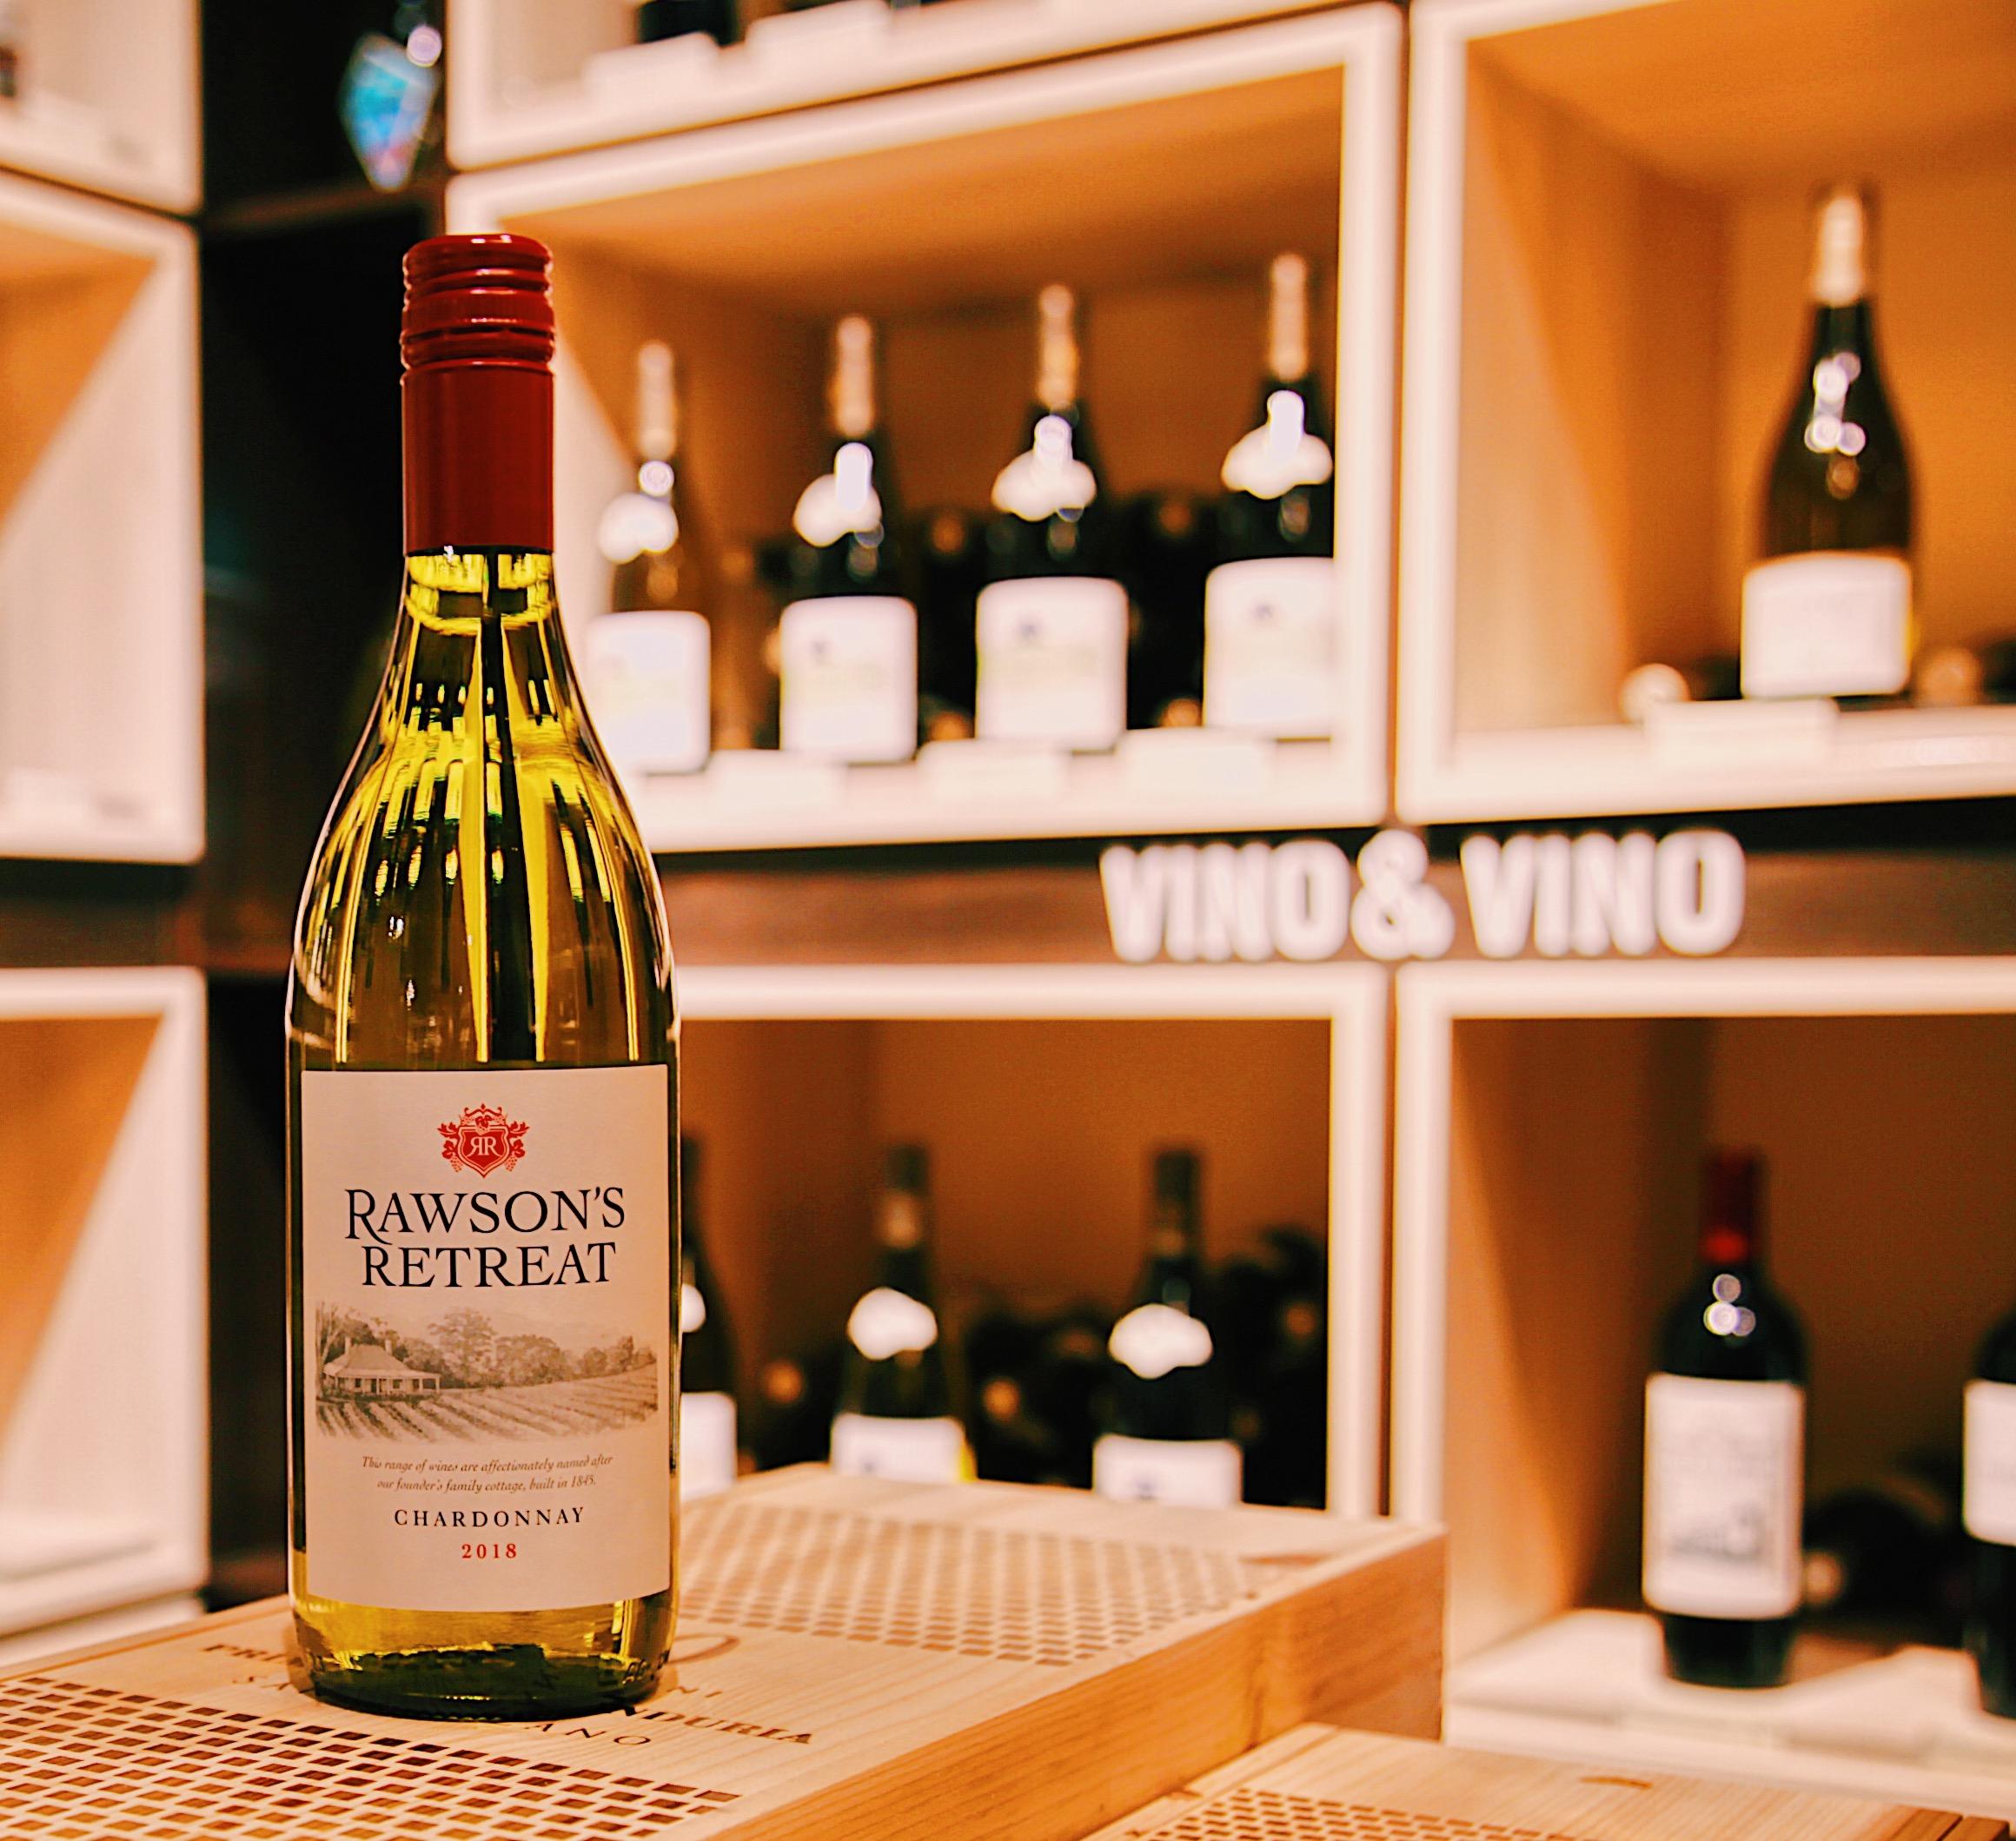 Rawsons Retreat – Chardonnay